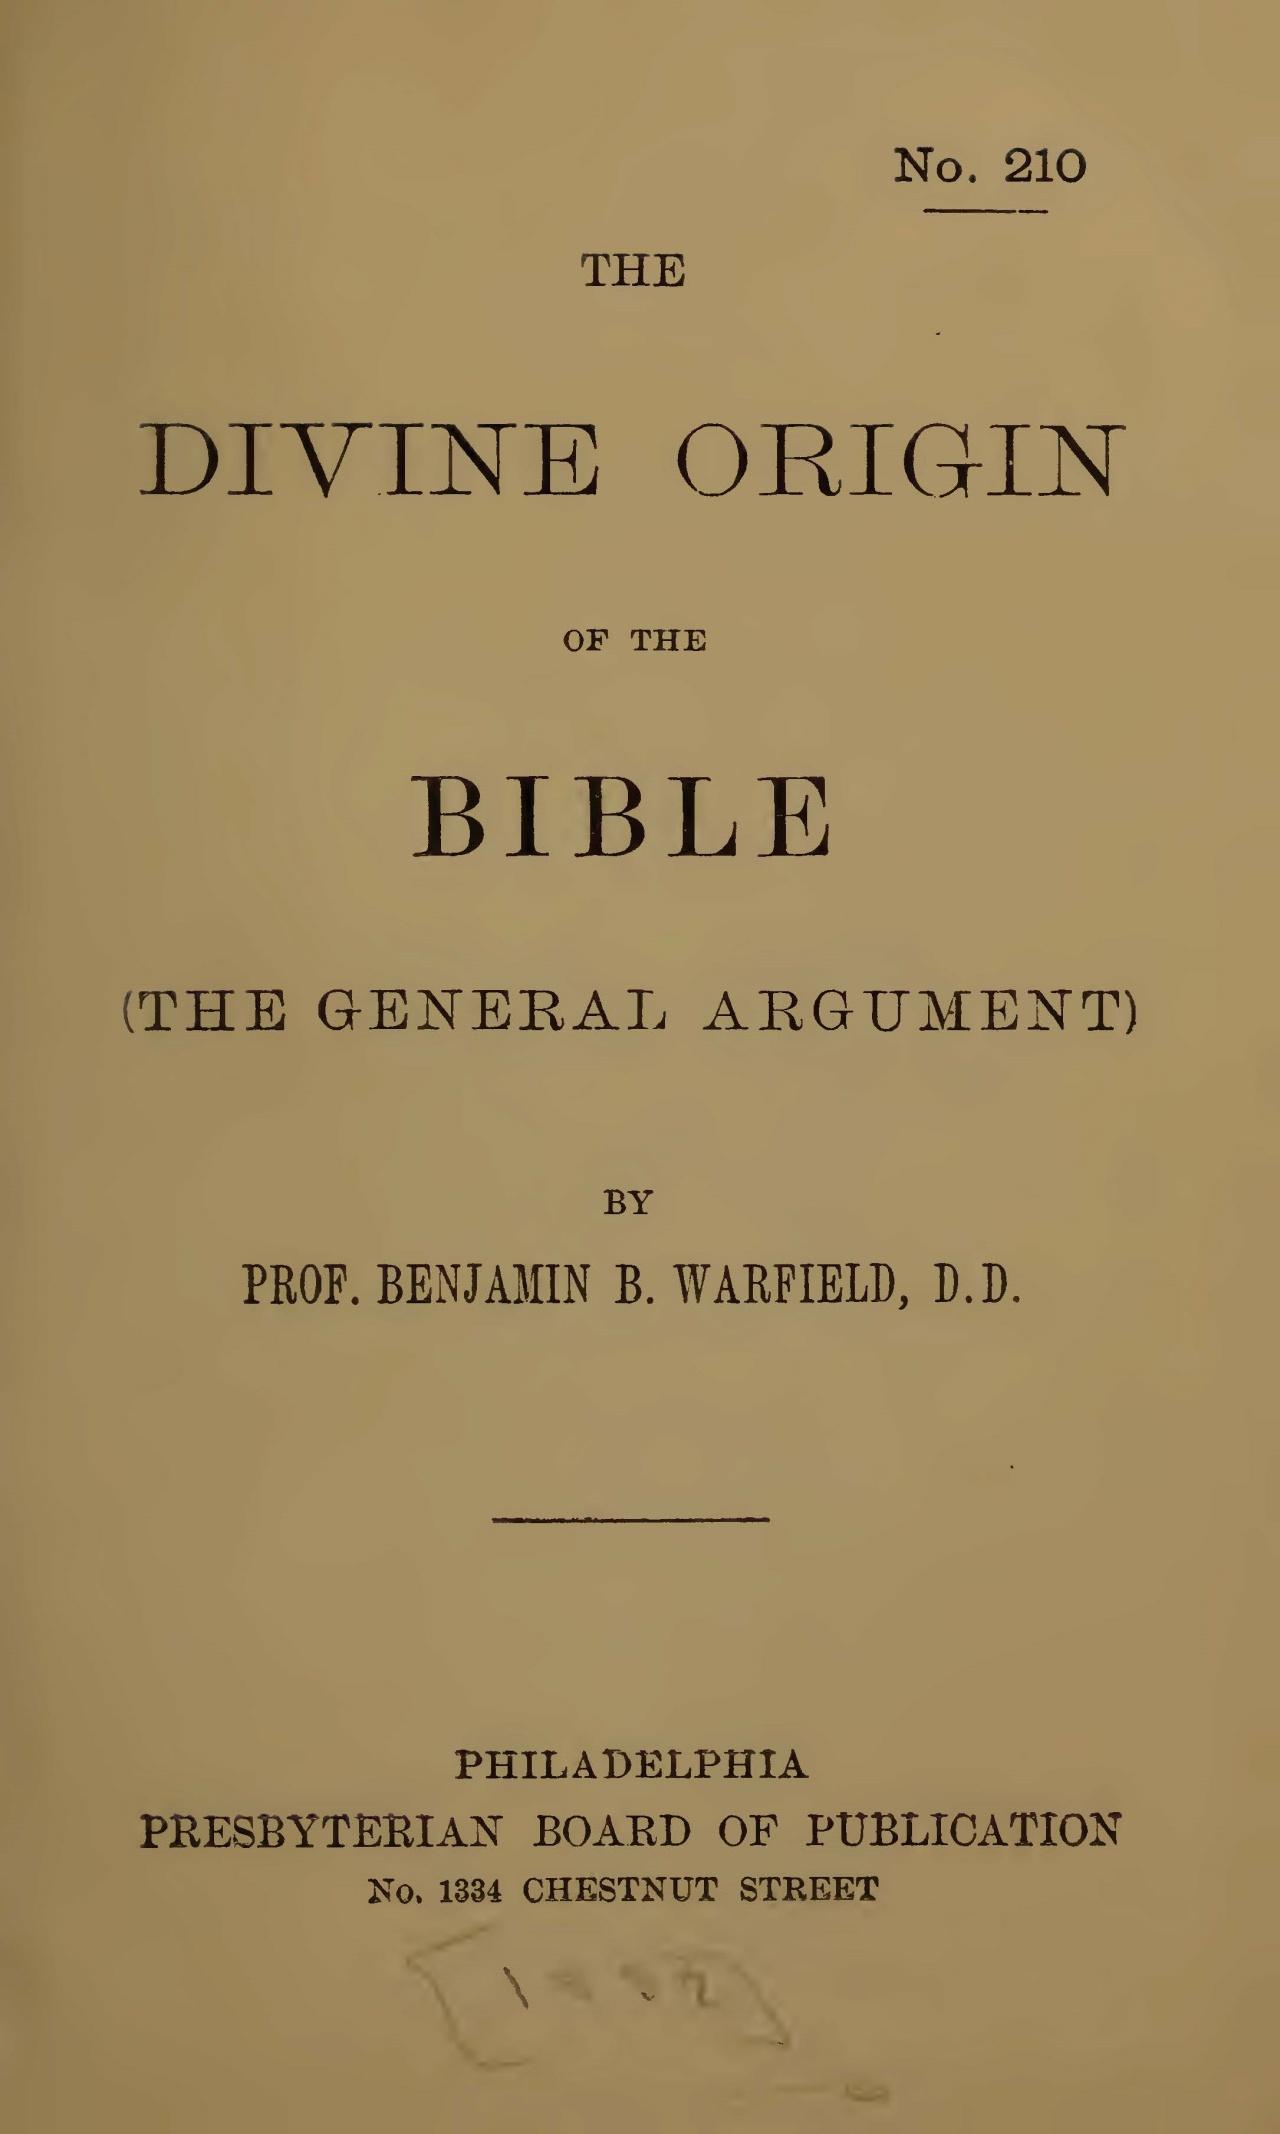 Warfield, Benjamin Breckinridge, The Divine Origin of the Bible Title Page.jpg